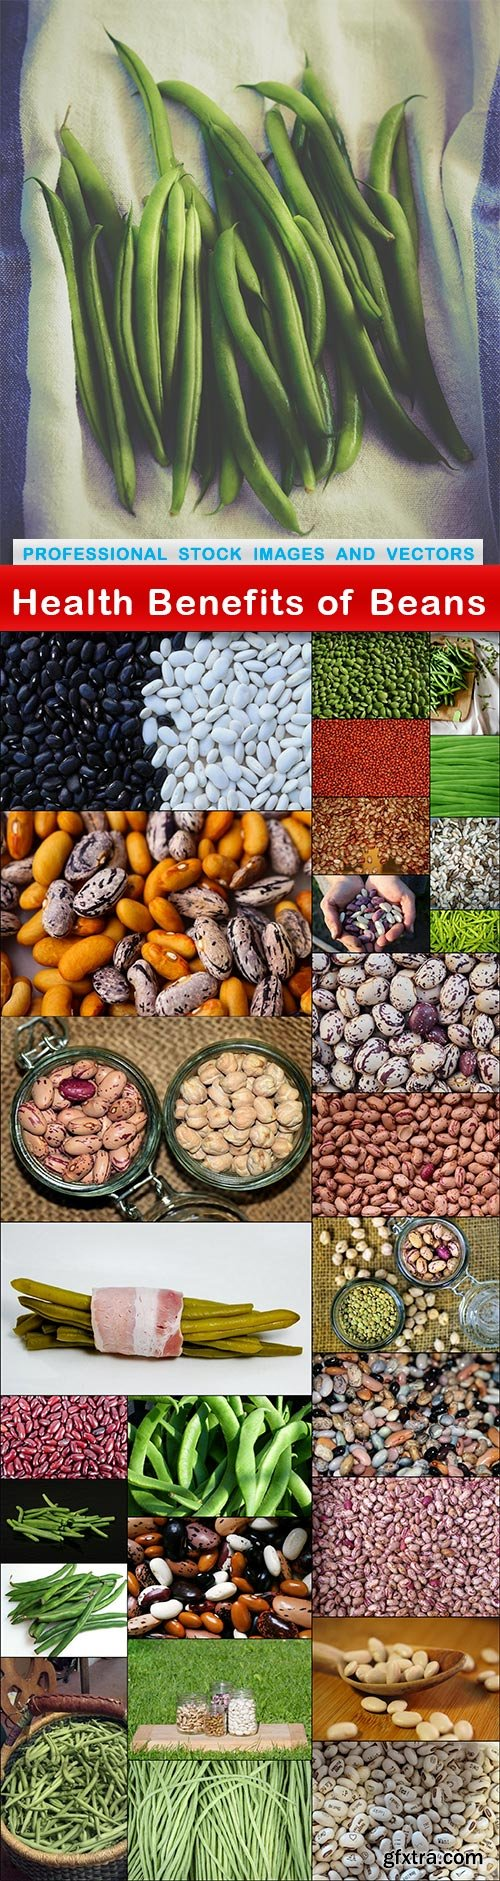 Health Benefits of Beans - 28 UHQ JPEG